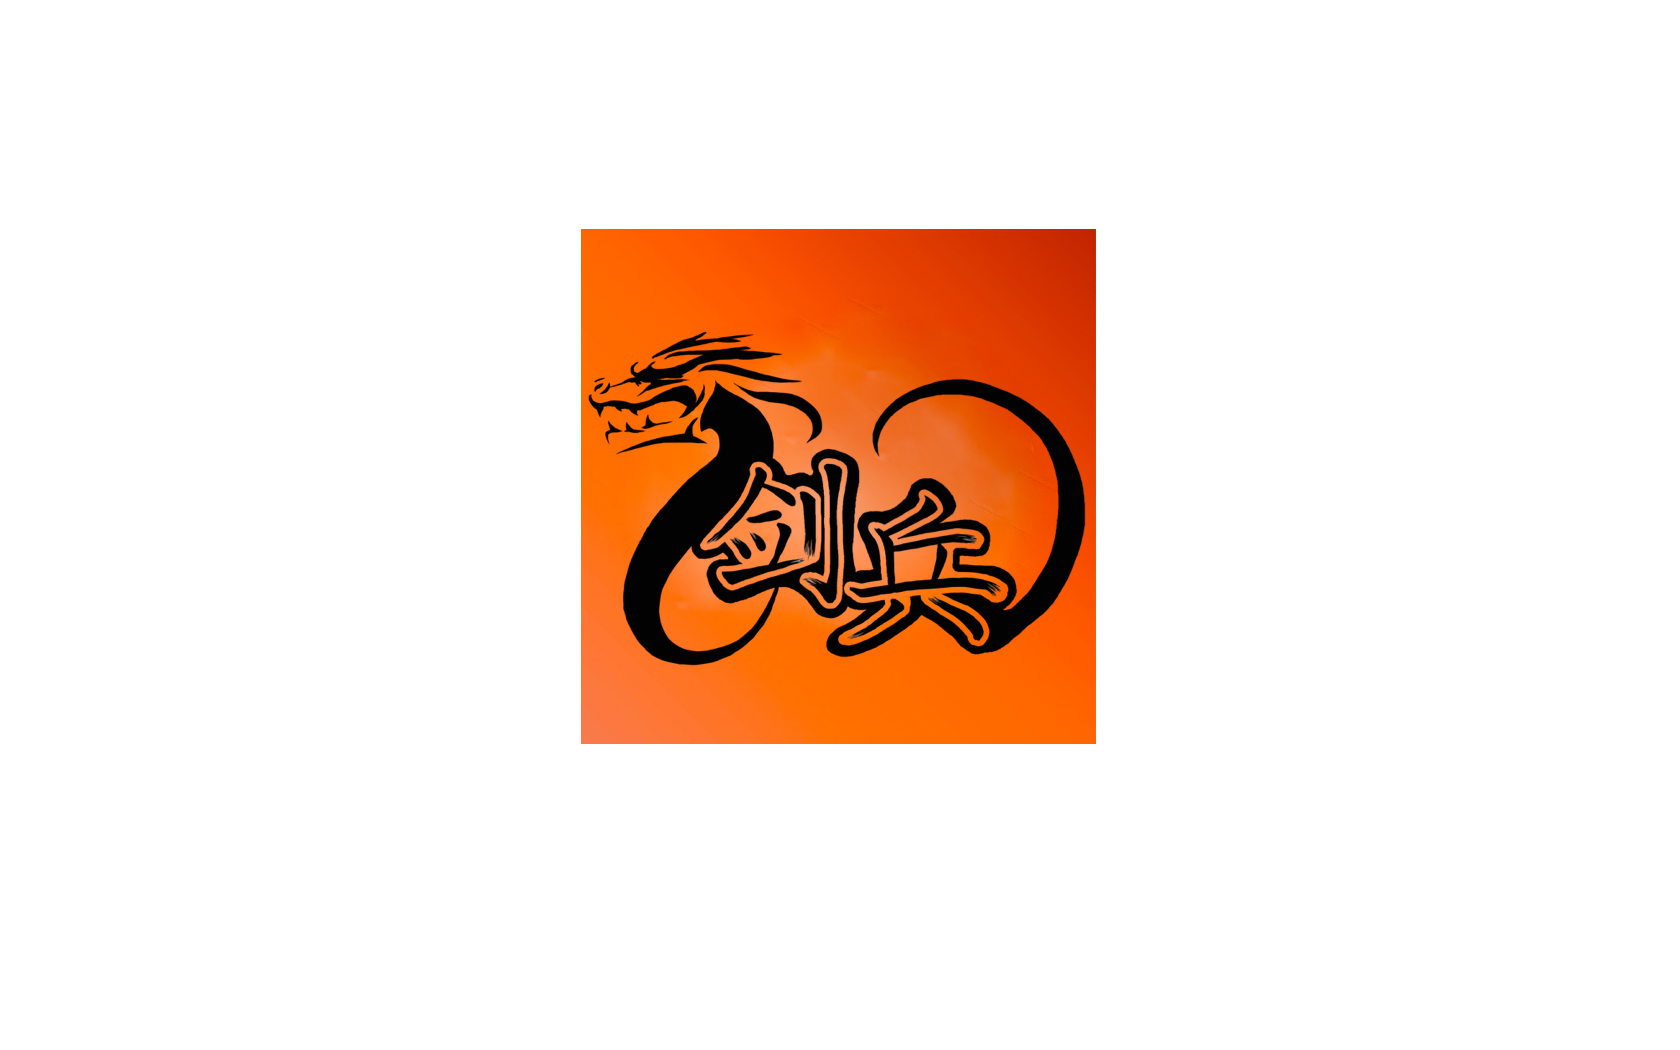 Bing Mi logo